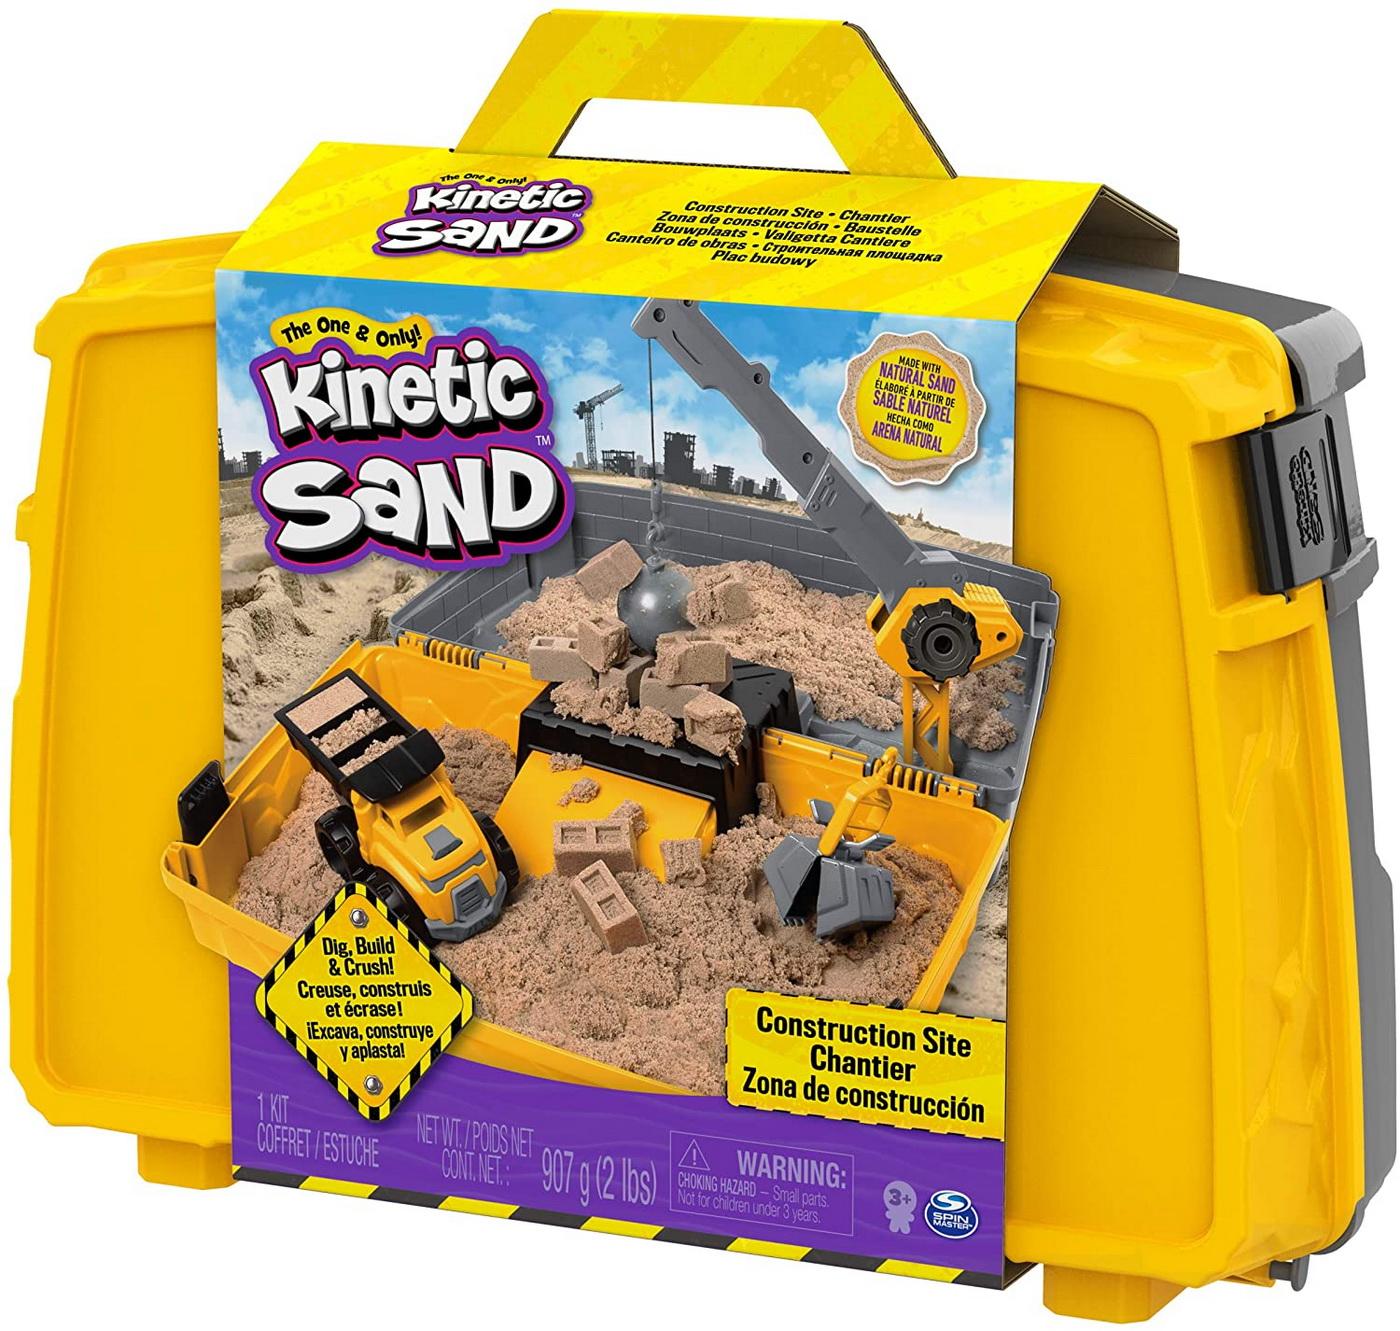 Kinetic Sand Set Excaveaza Construieste Si Demoleaza In Cutie Cu Maner